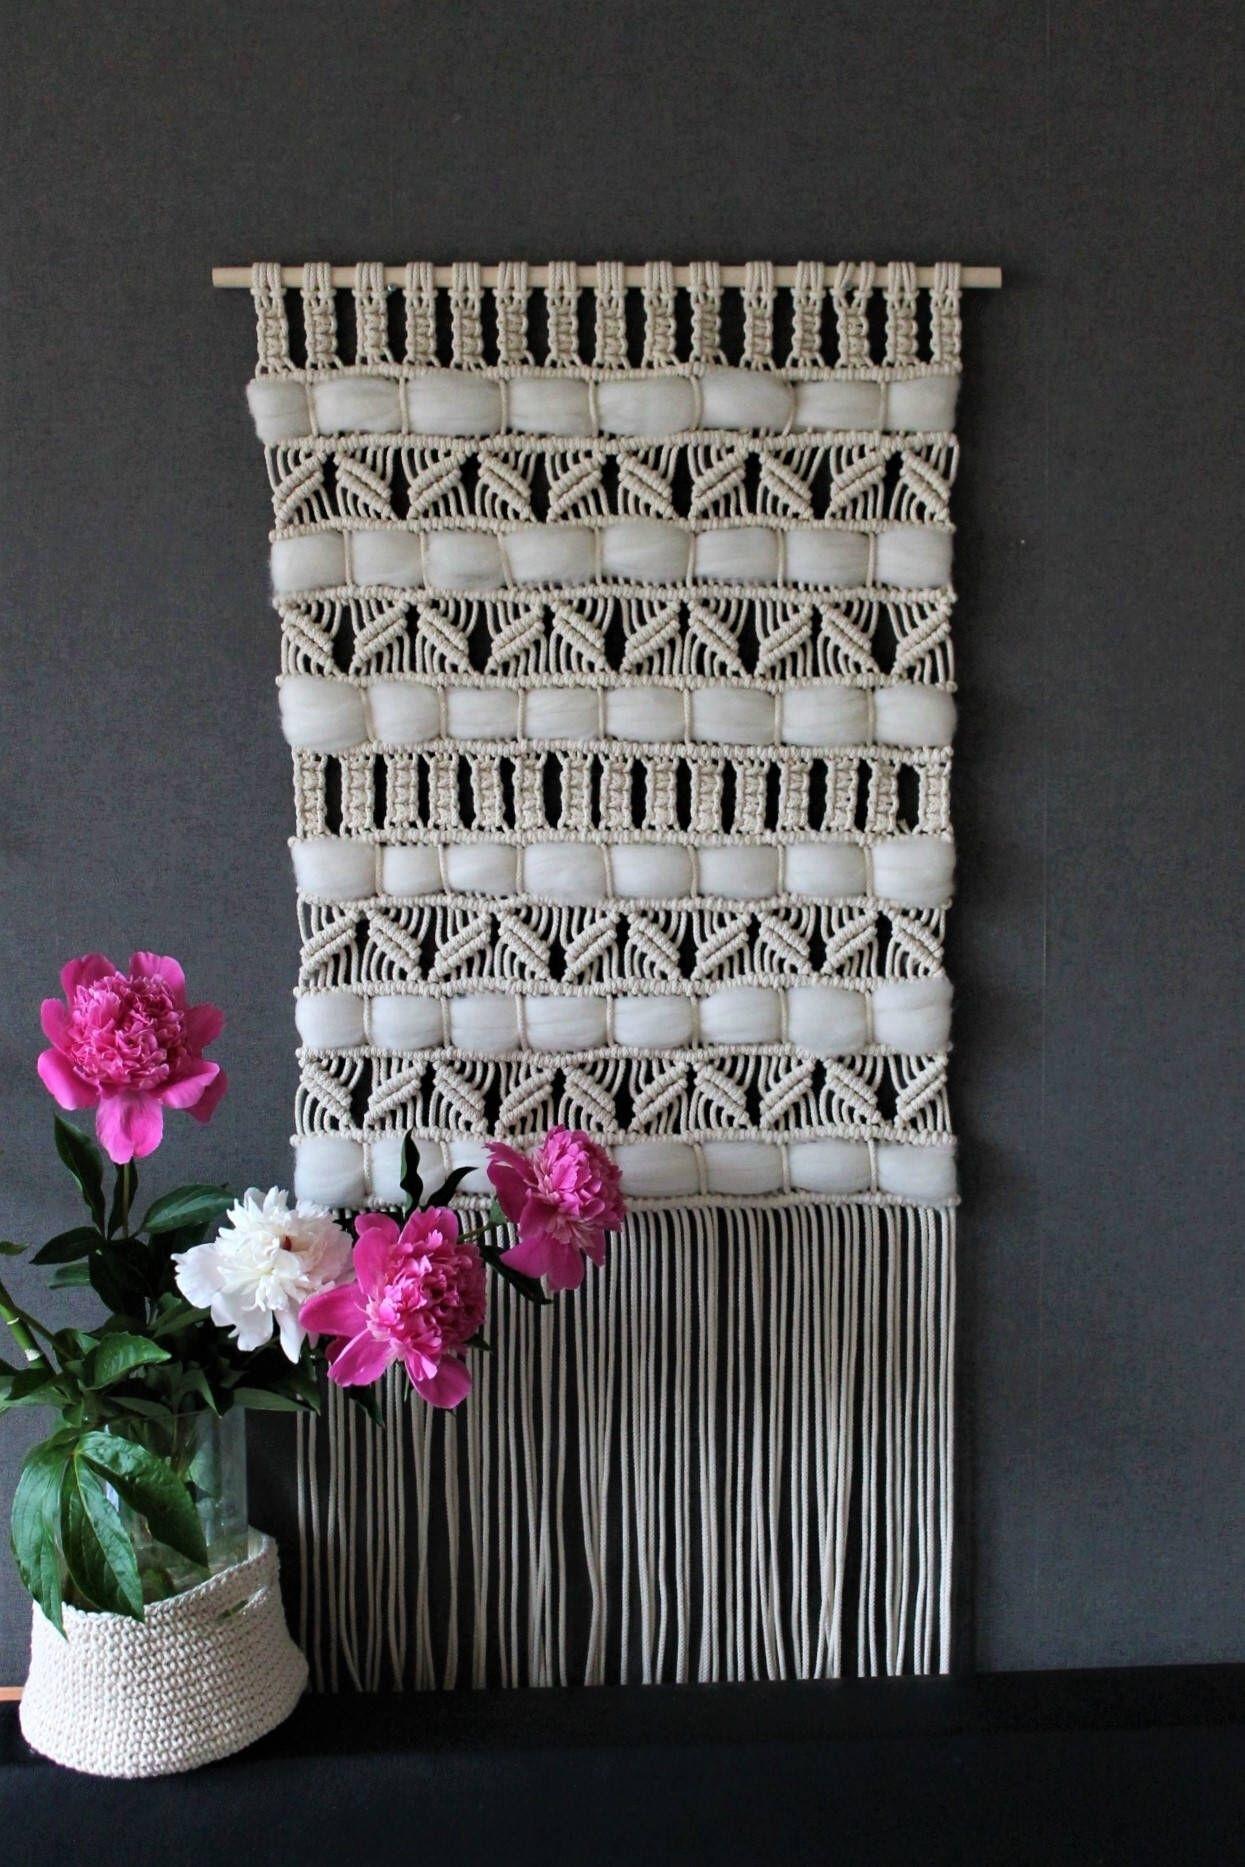 33 Elegant Crochet Wall Art | Wall Art Decorative With Recent Crochet Wall Art (View 1 of 20)